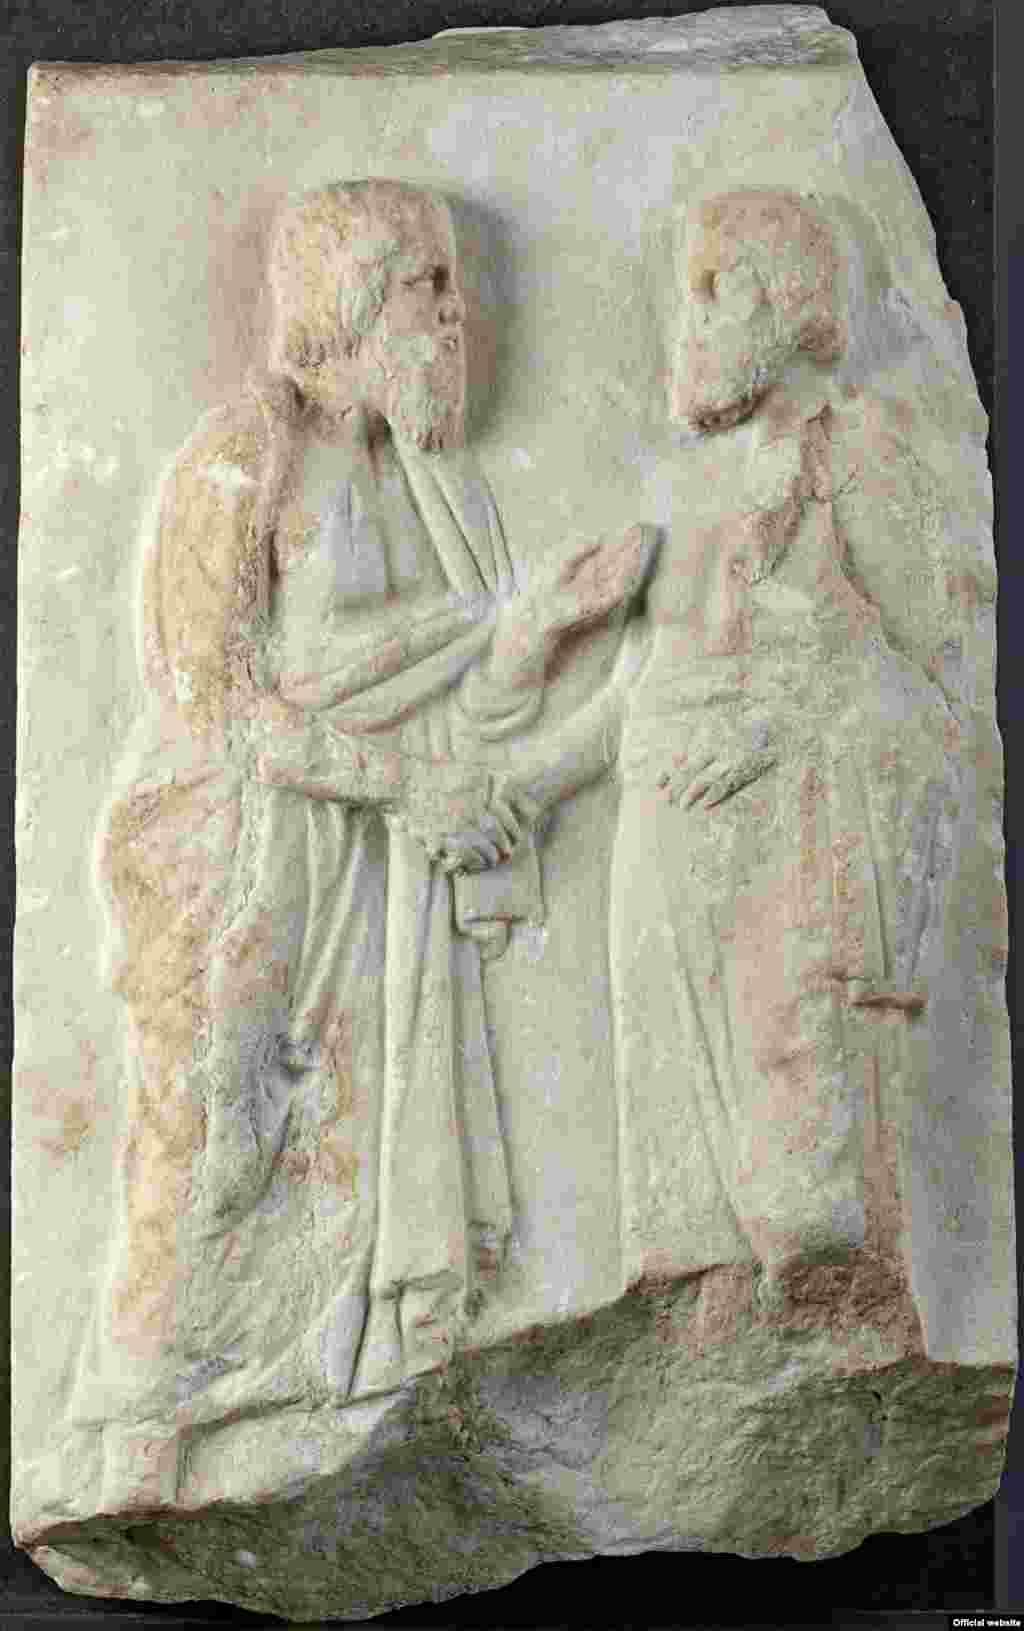 Relief funerar cu doi bătrâni, Grecia, cca. 340 î.e.n. ( Liebieghaus Skulpturensammlung, Frankfurt am Main, Photo: Liebieghaus Skulpturensammlung – ARTOTHEK).